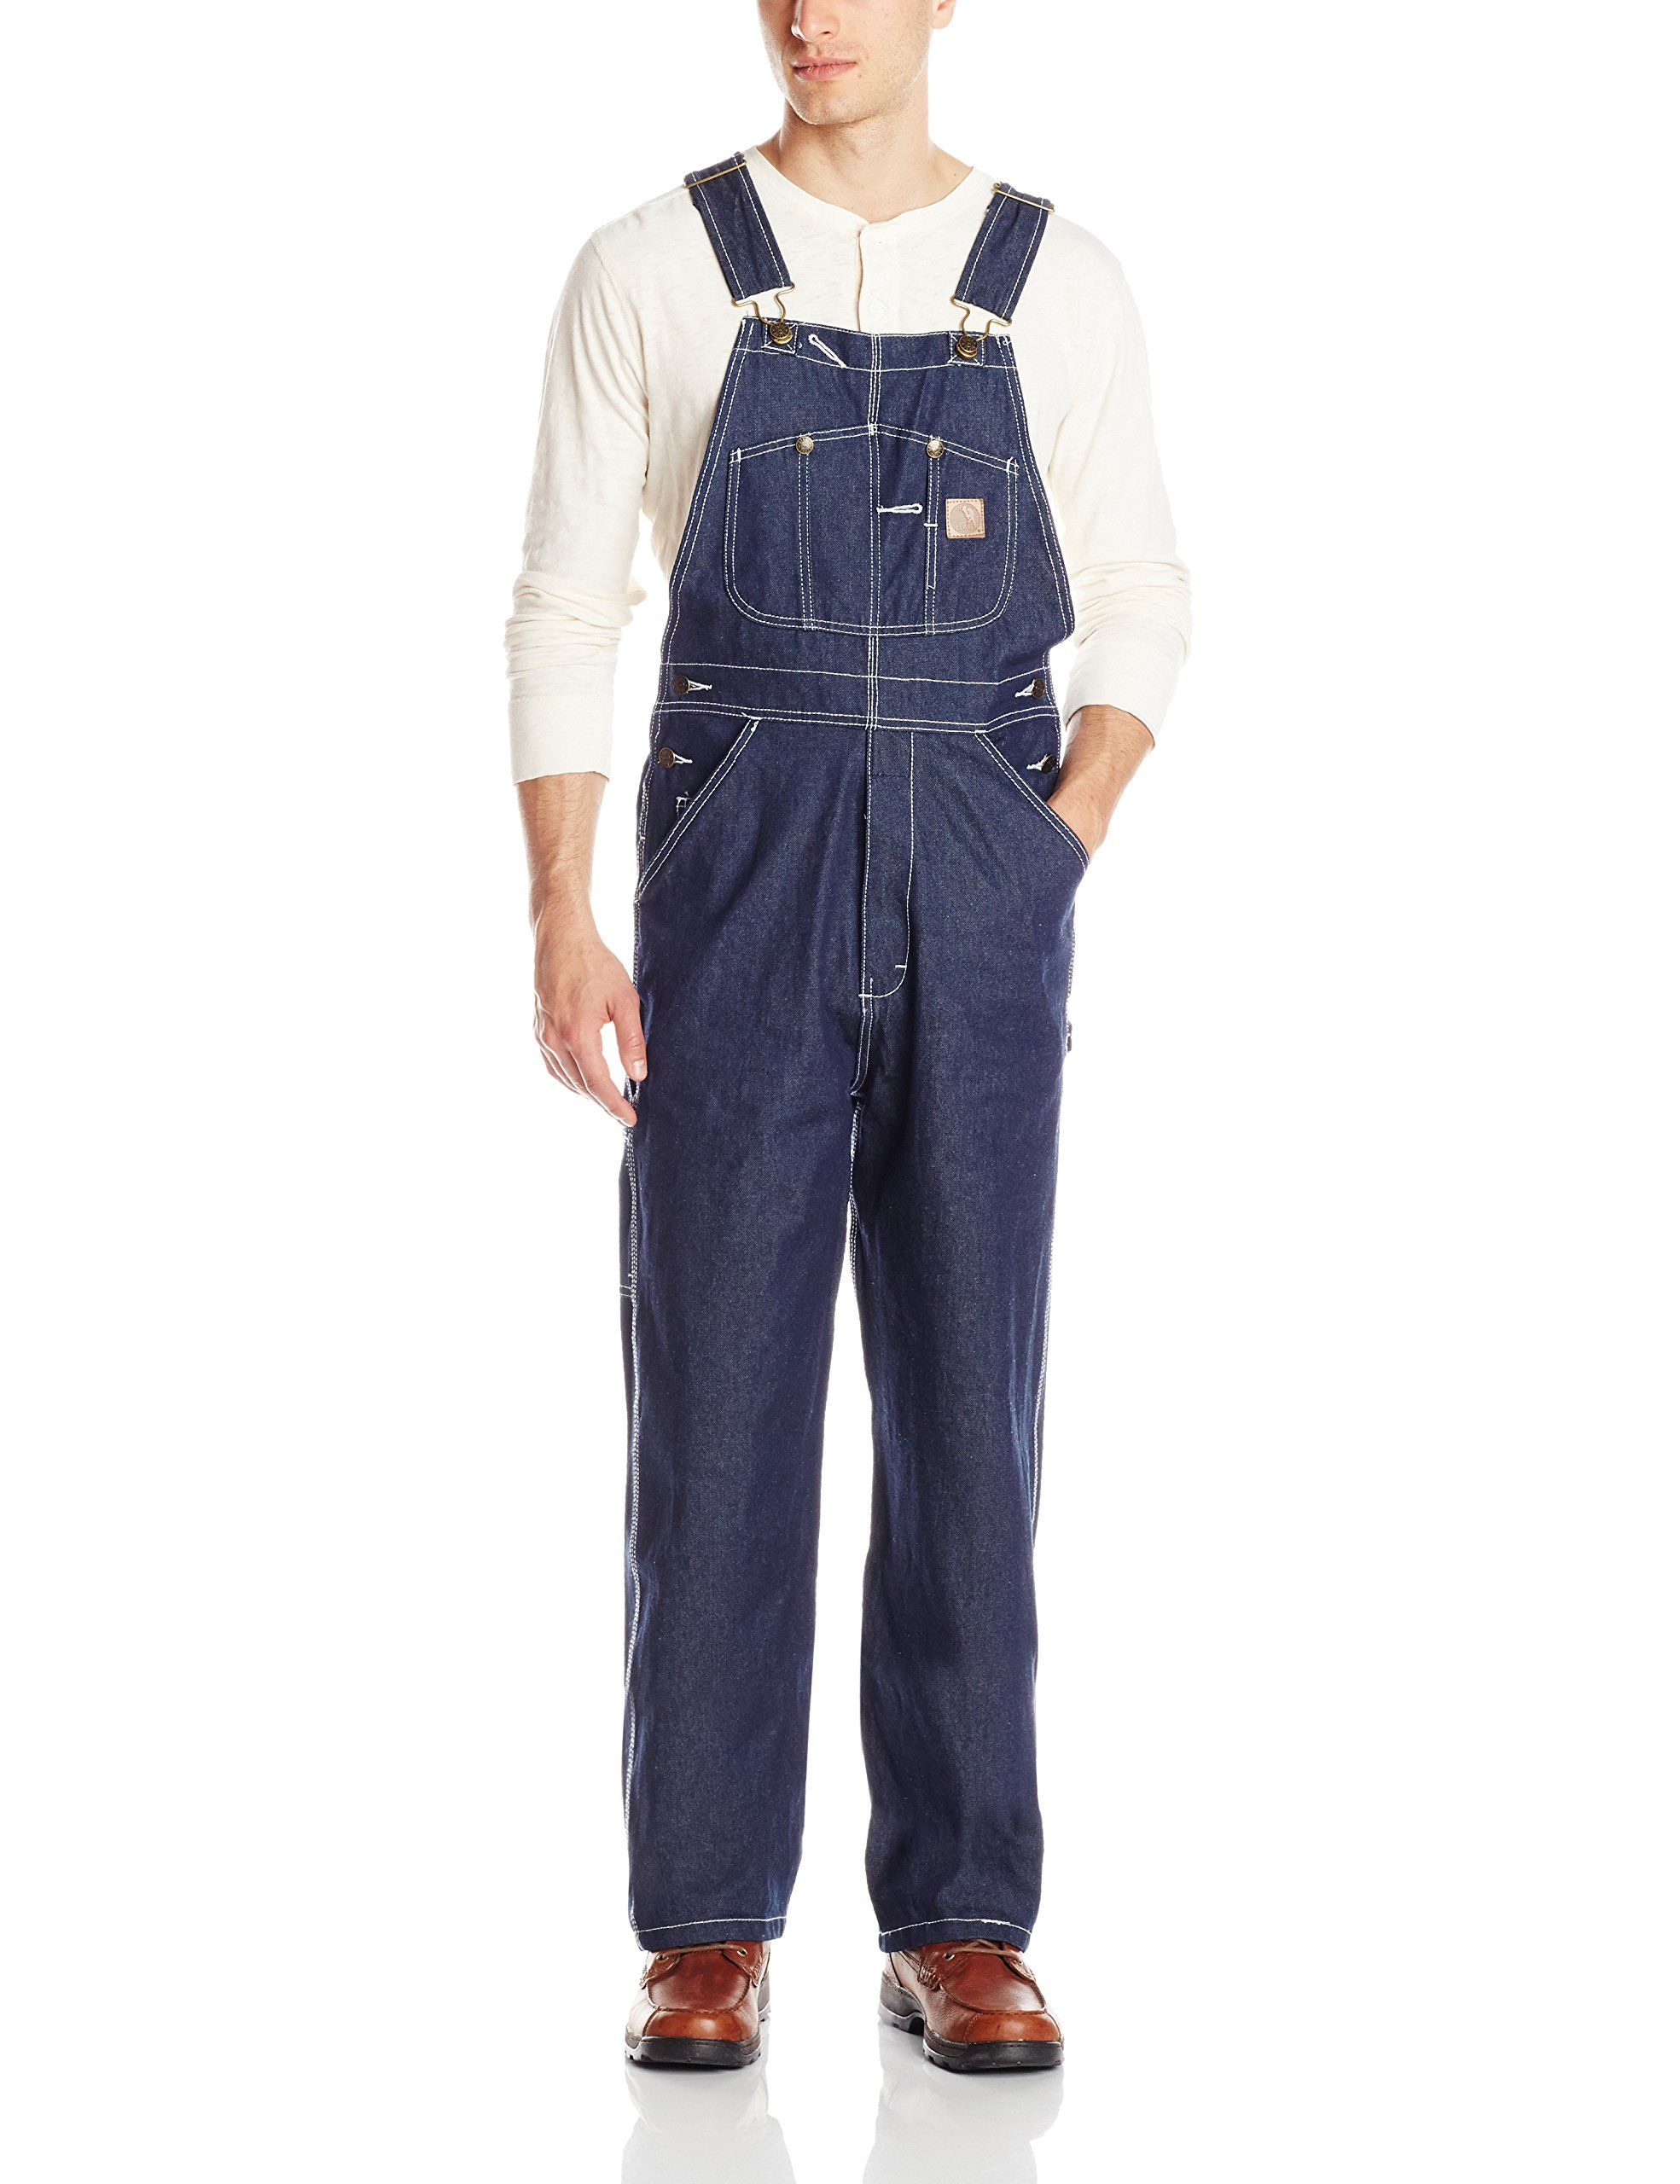 berne men s original unlined bib overall overalls bib on cheap insulated coveralls for men id=17399